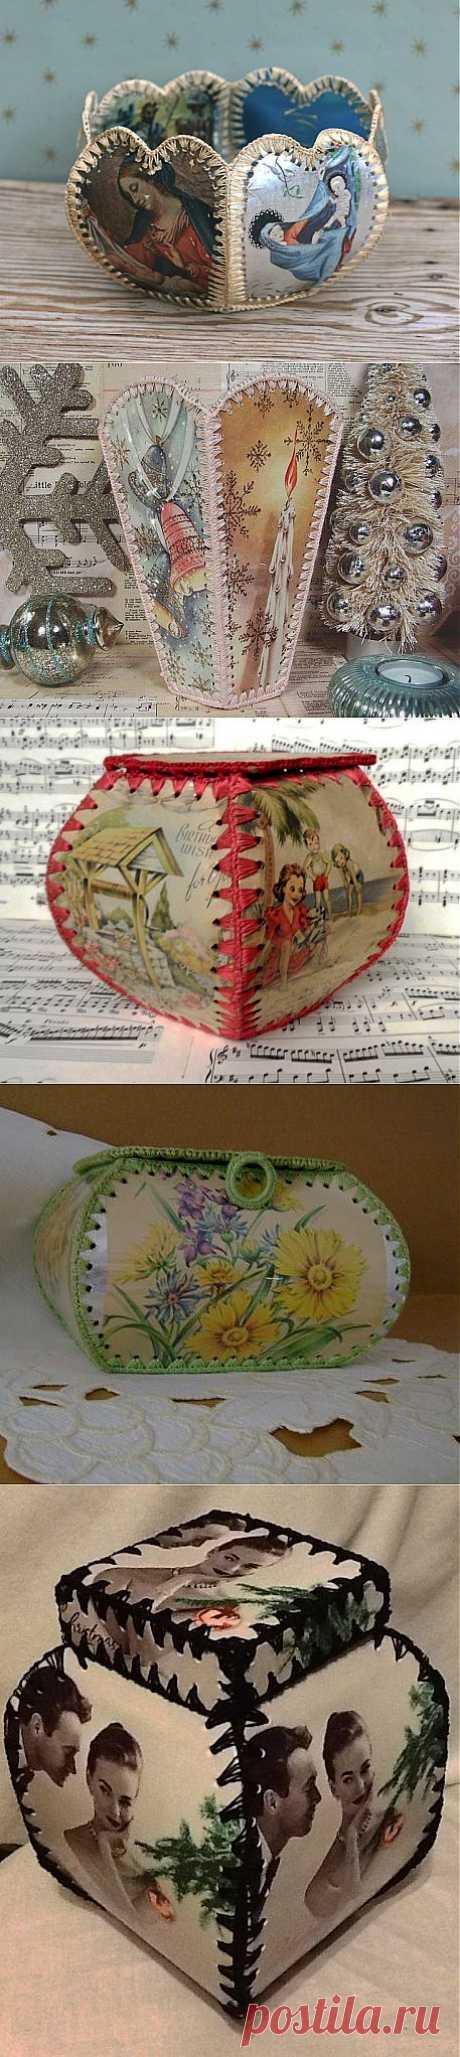 Подборка шкатулок и вазочек из открыток | Варварушка-Рукодельница